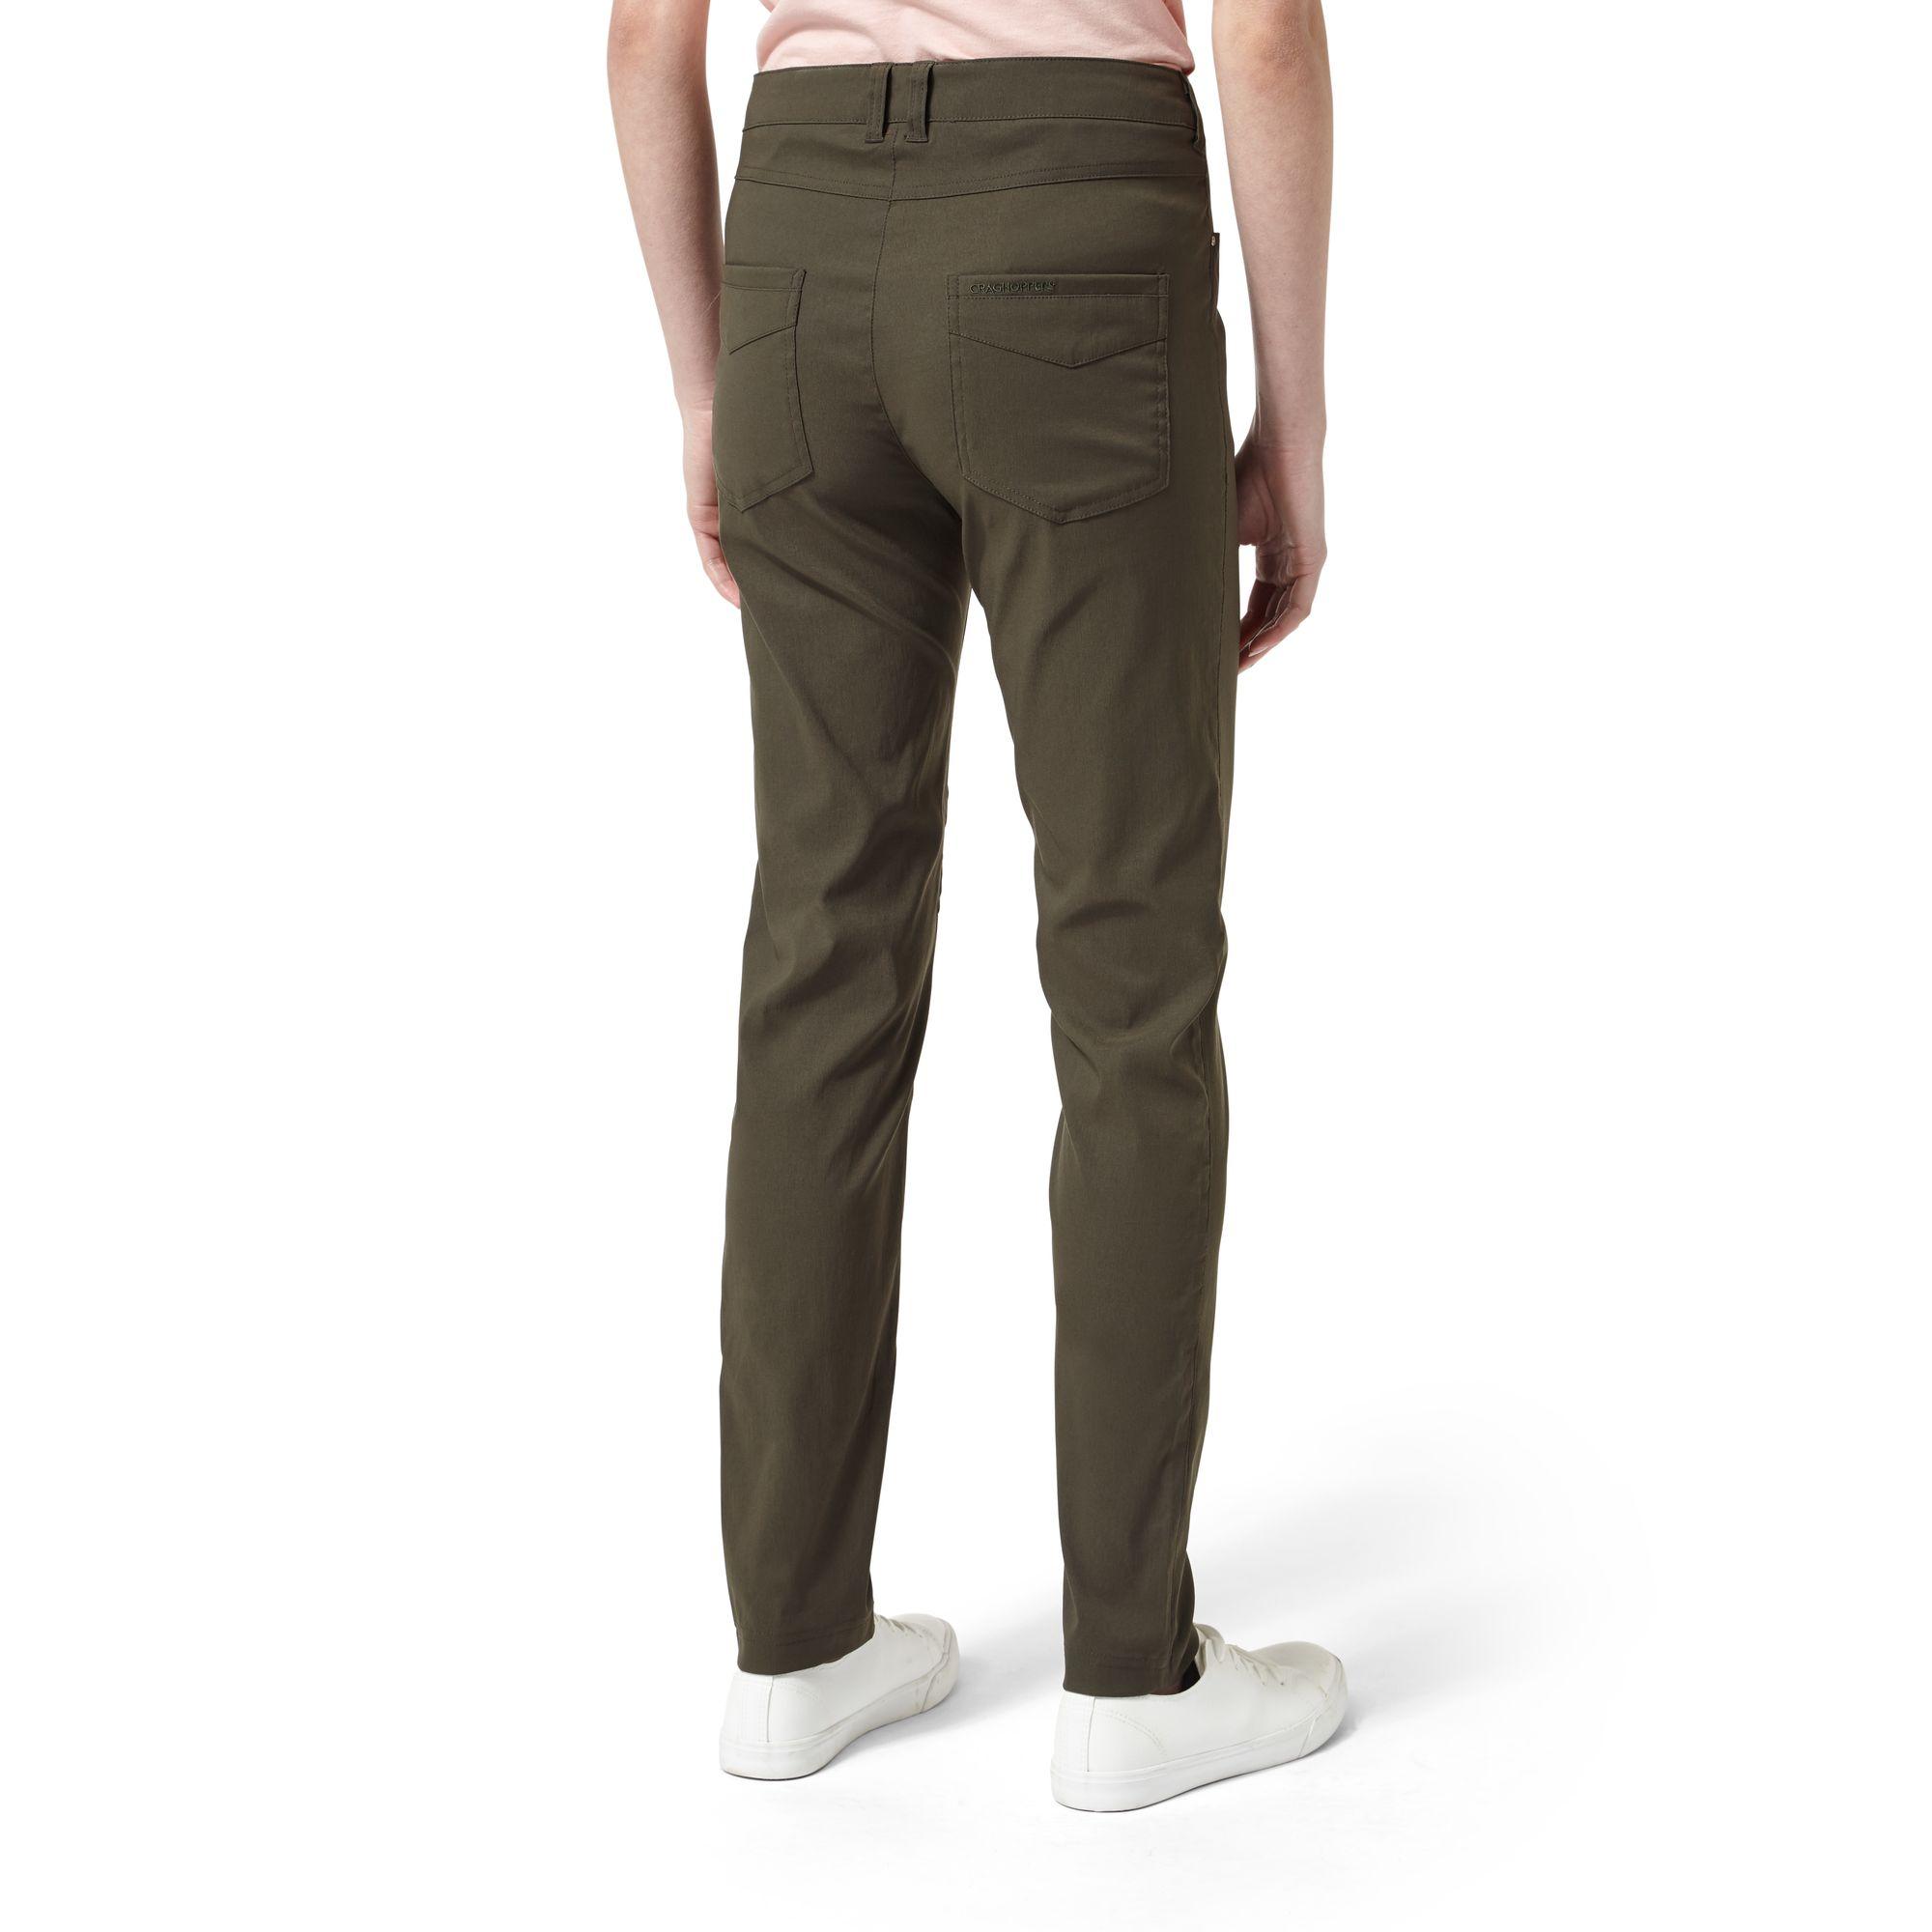 Craghoppers-Pantalon-ADVENTURE-Femme-CG869 miniature 5